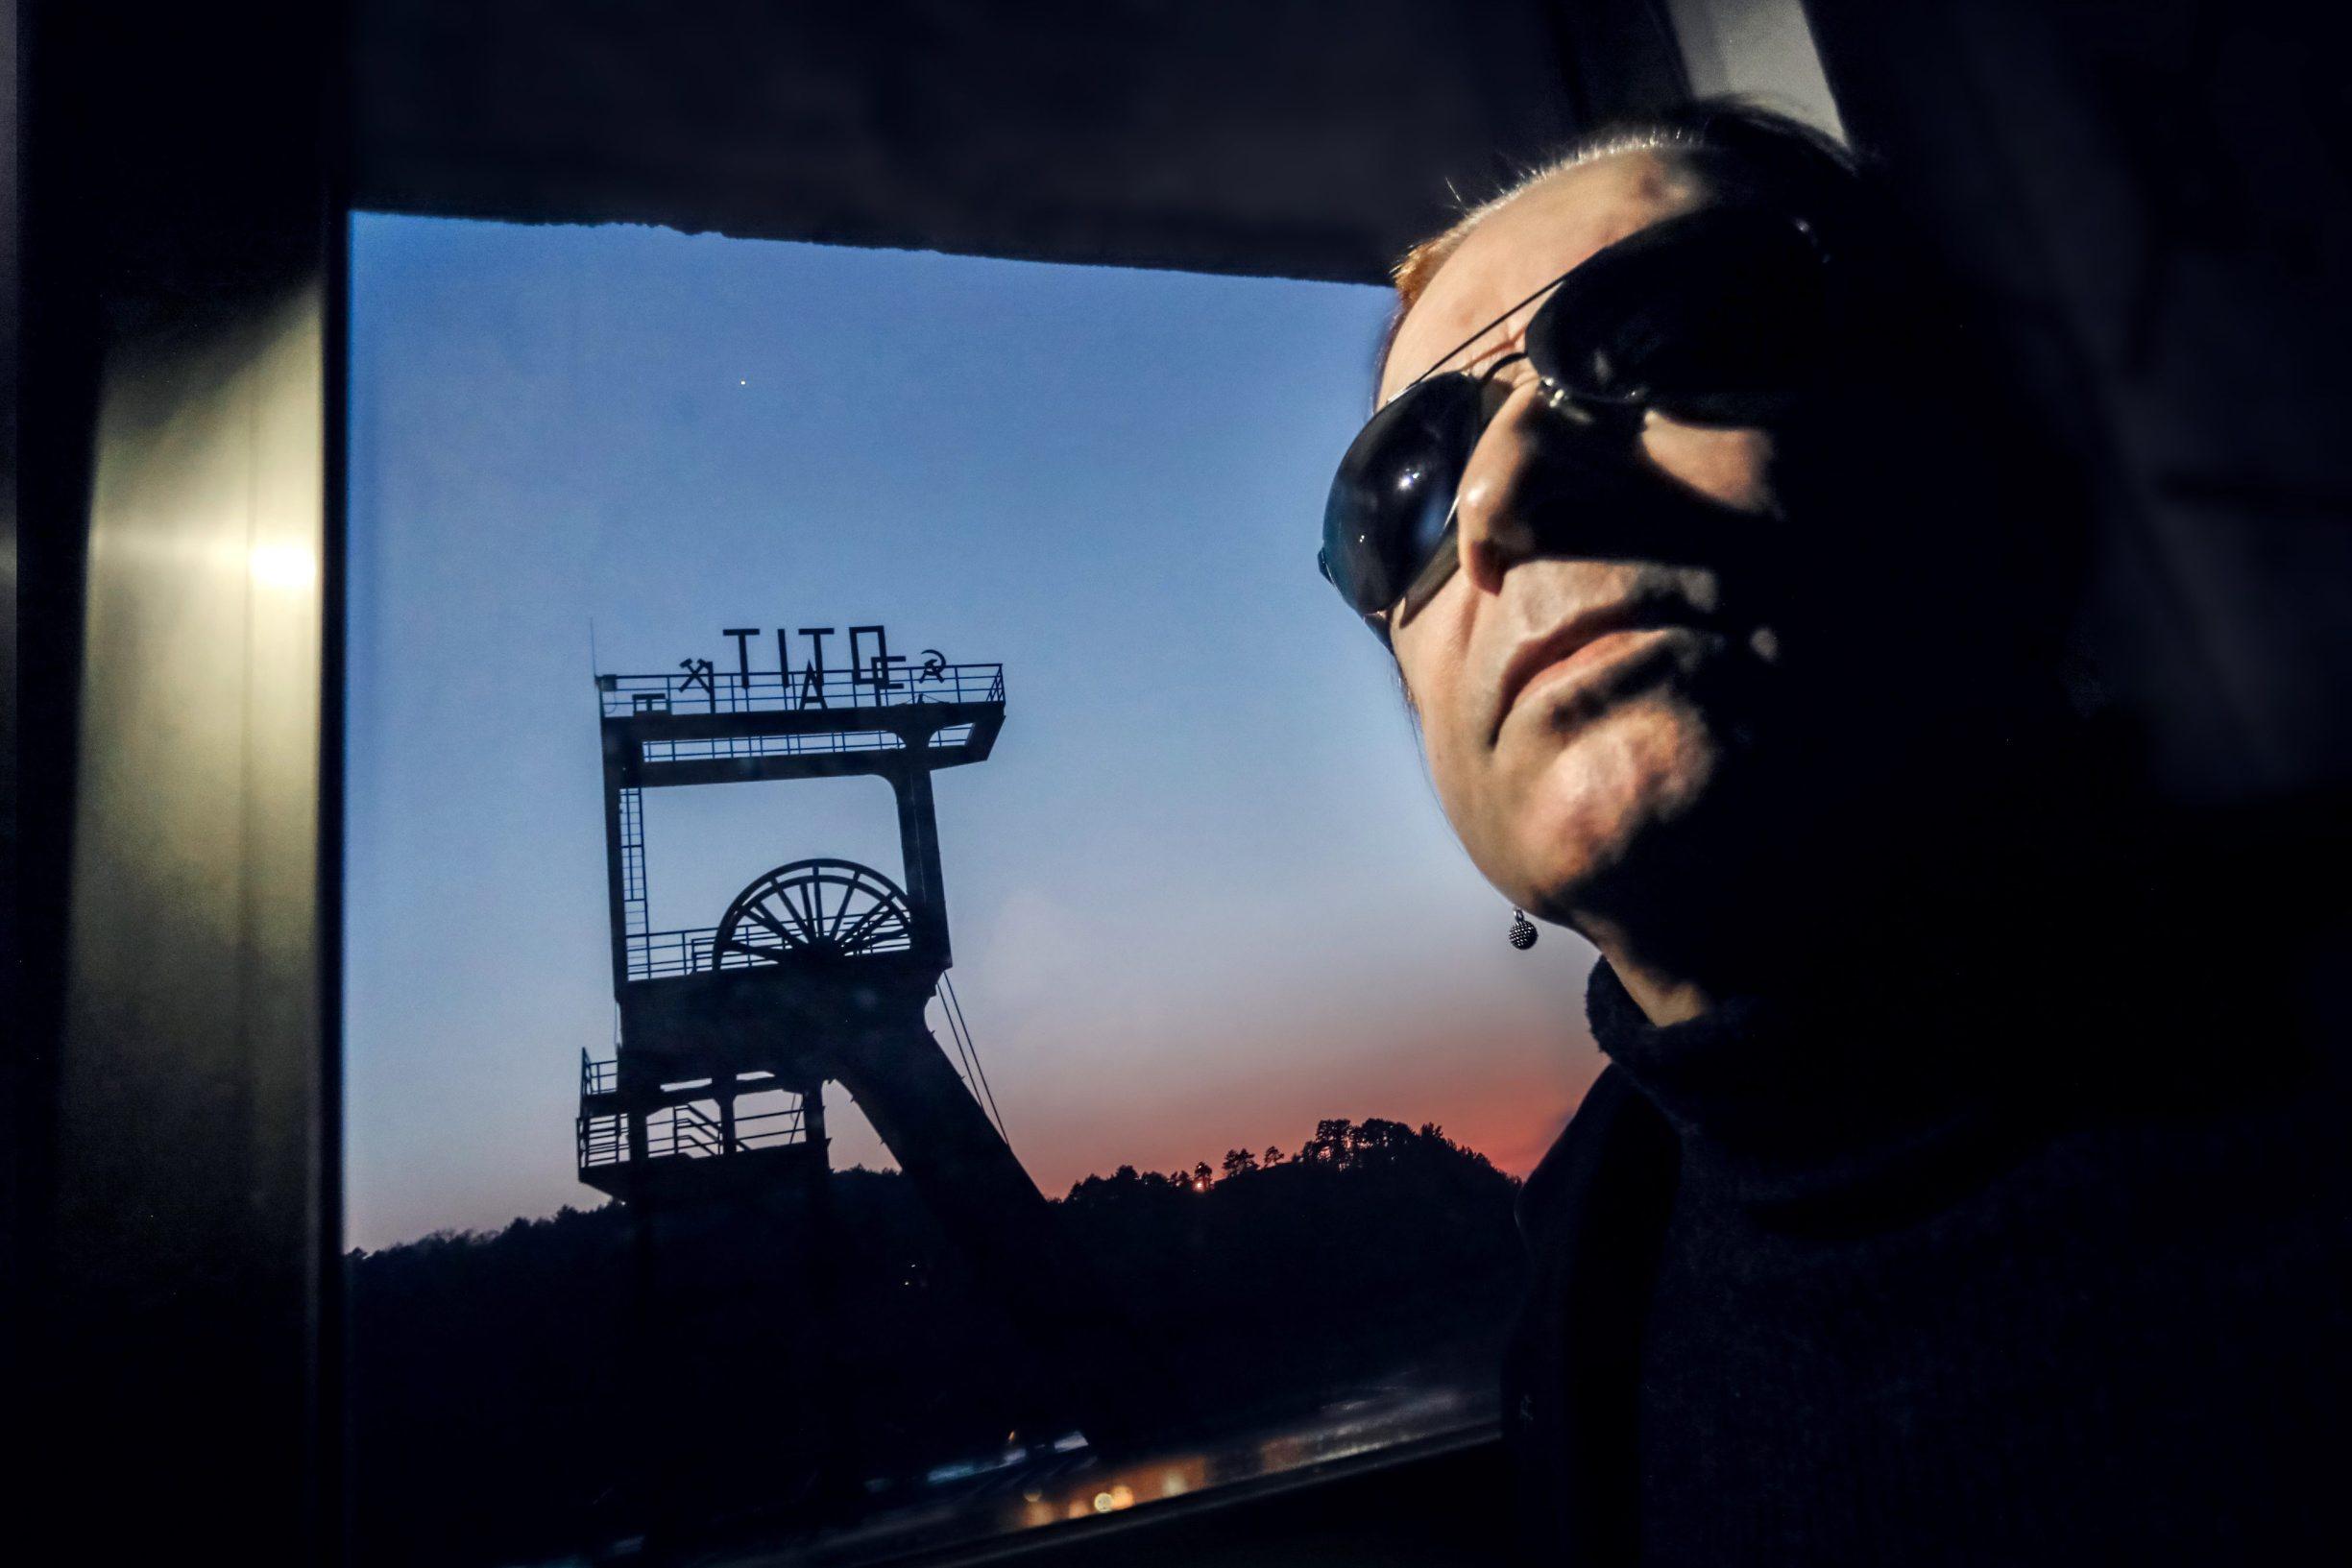 Labin, 250220 Reportaza o gradu Labinu u ciklusu I to je Hrvatska.  Na fotografiji Dean Zahtila predsjednik Labin Art Ekspressa u KUC-u Lamparna. Foto: Danijel Soldo / CROPIX